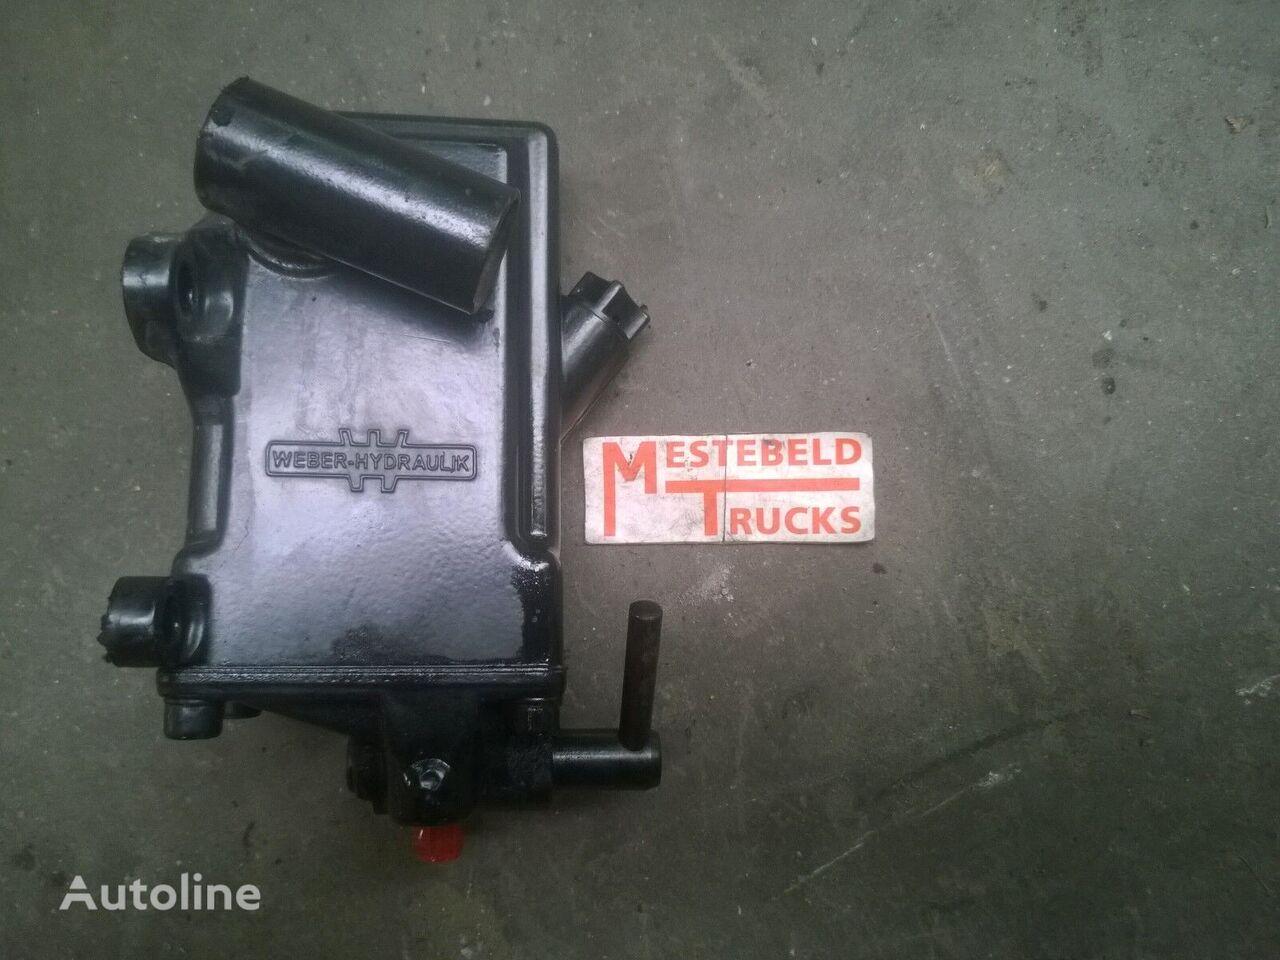 pezzi di ricambi Cabine kantelcilinder RENAULT per trattore stradale RENAULT Cabine kantelcilinder Midlum